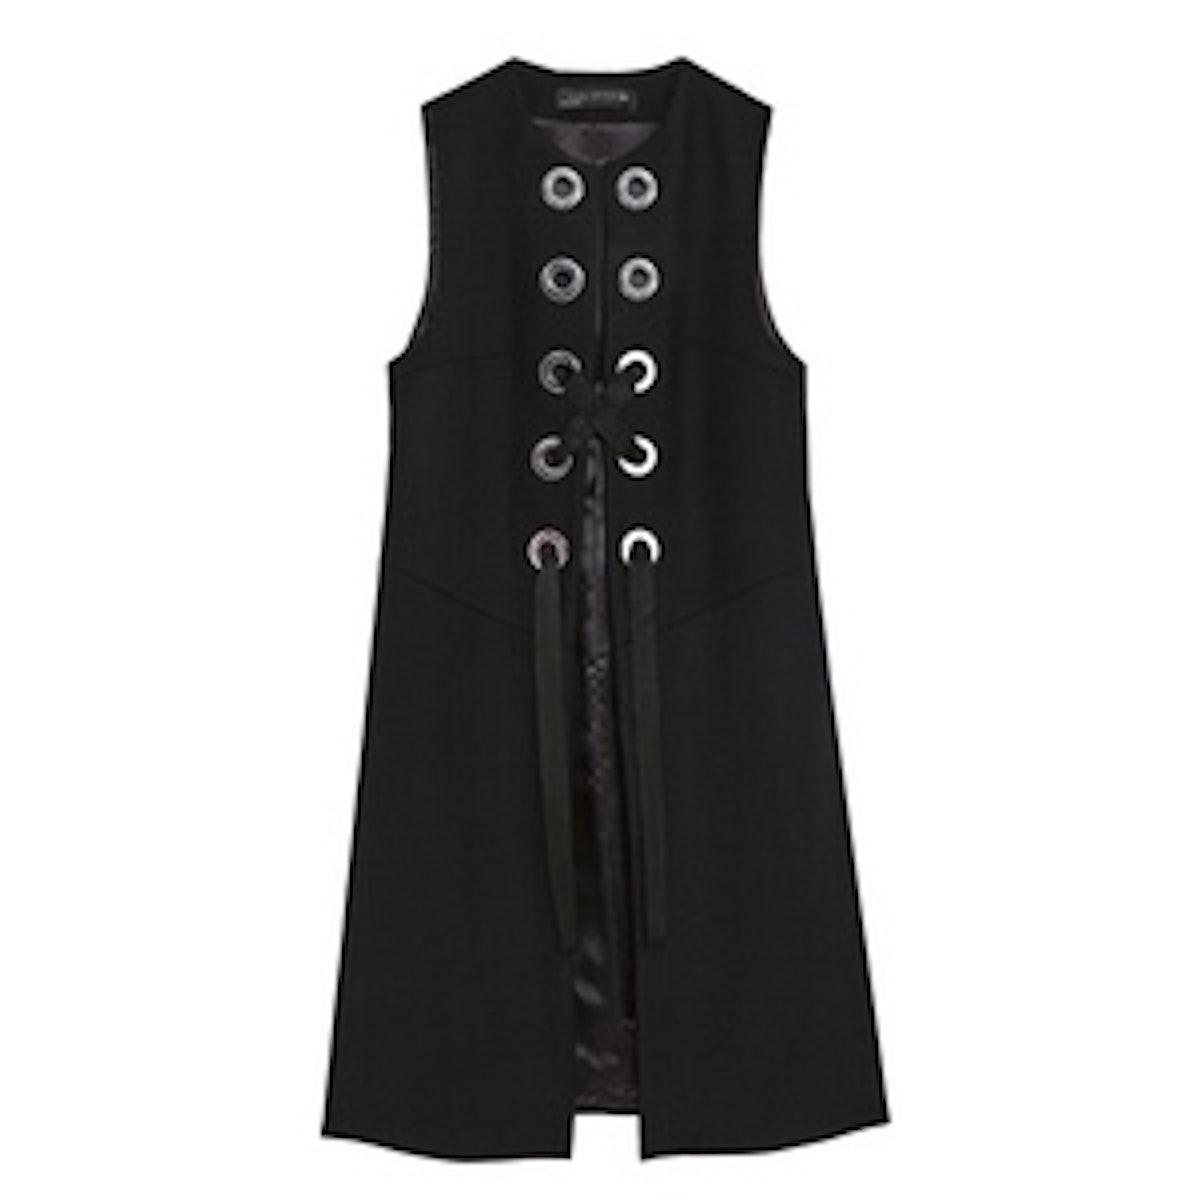 Long Waistcoat With Metallic Details